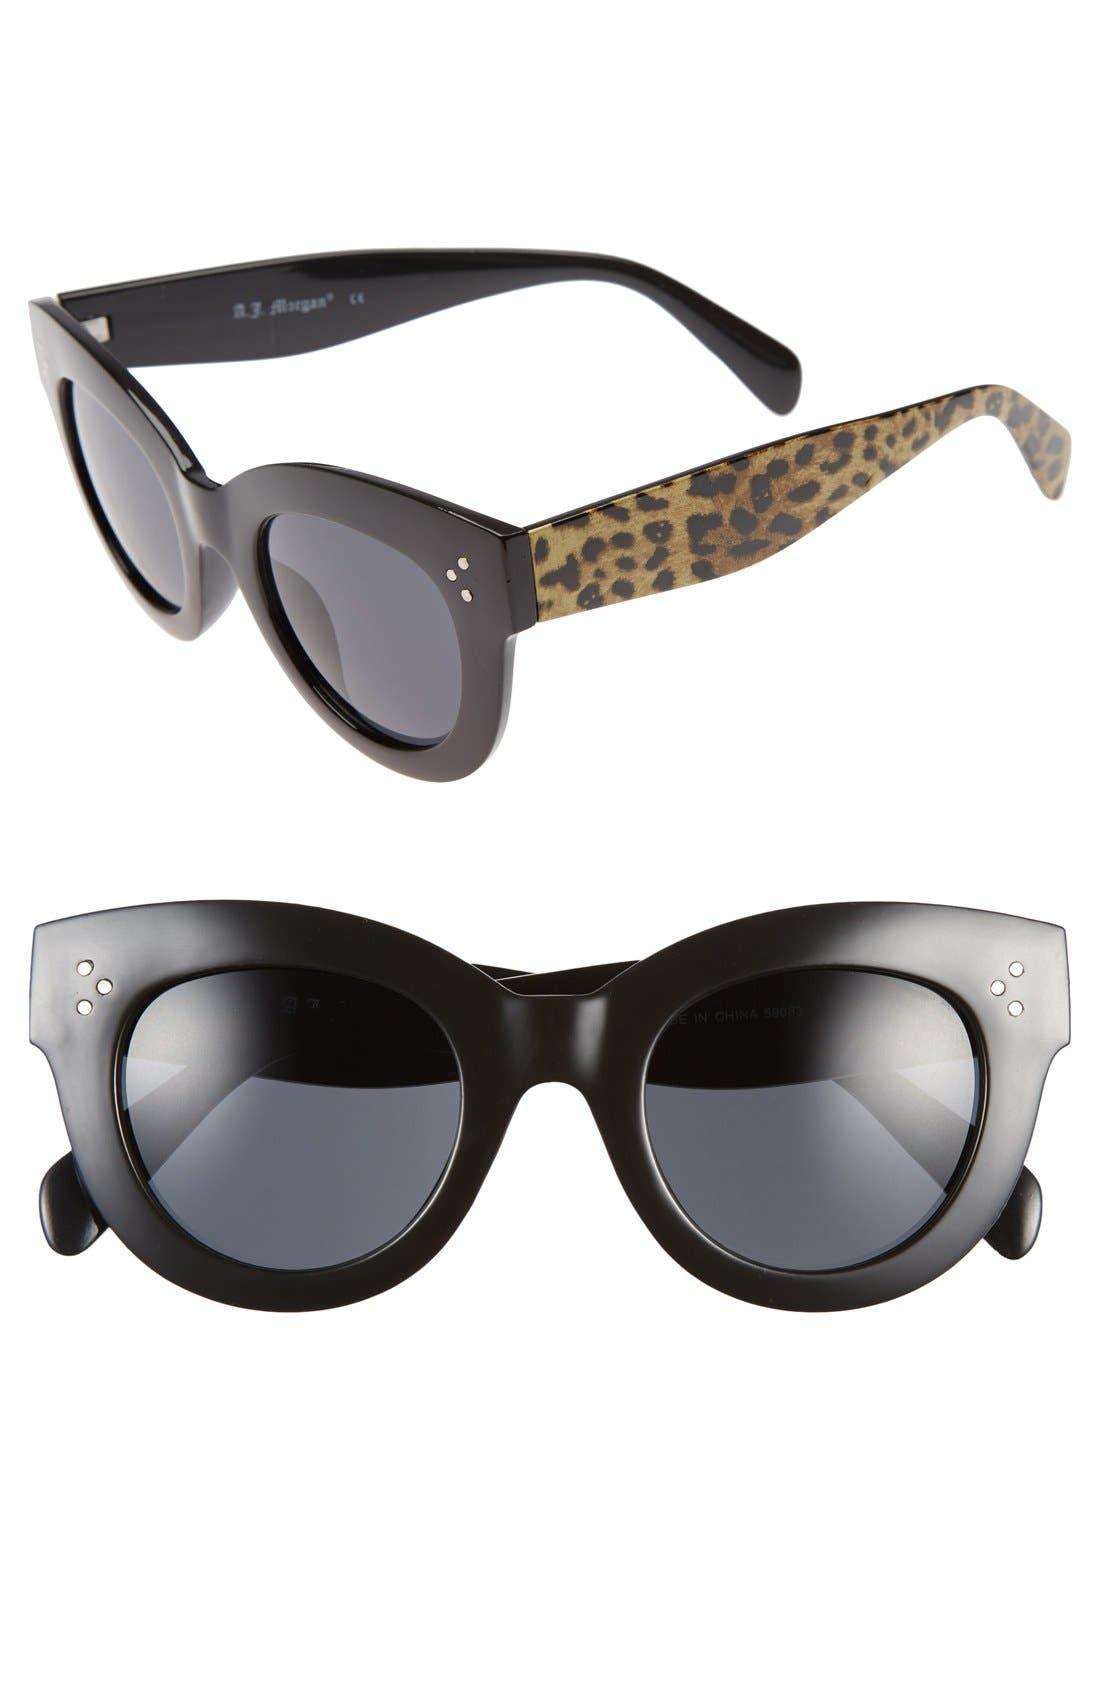 Main Image - A.J. Morgan 'Kitty' 54mm Oversized Cat Eye Sunglasses